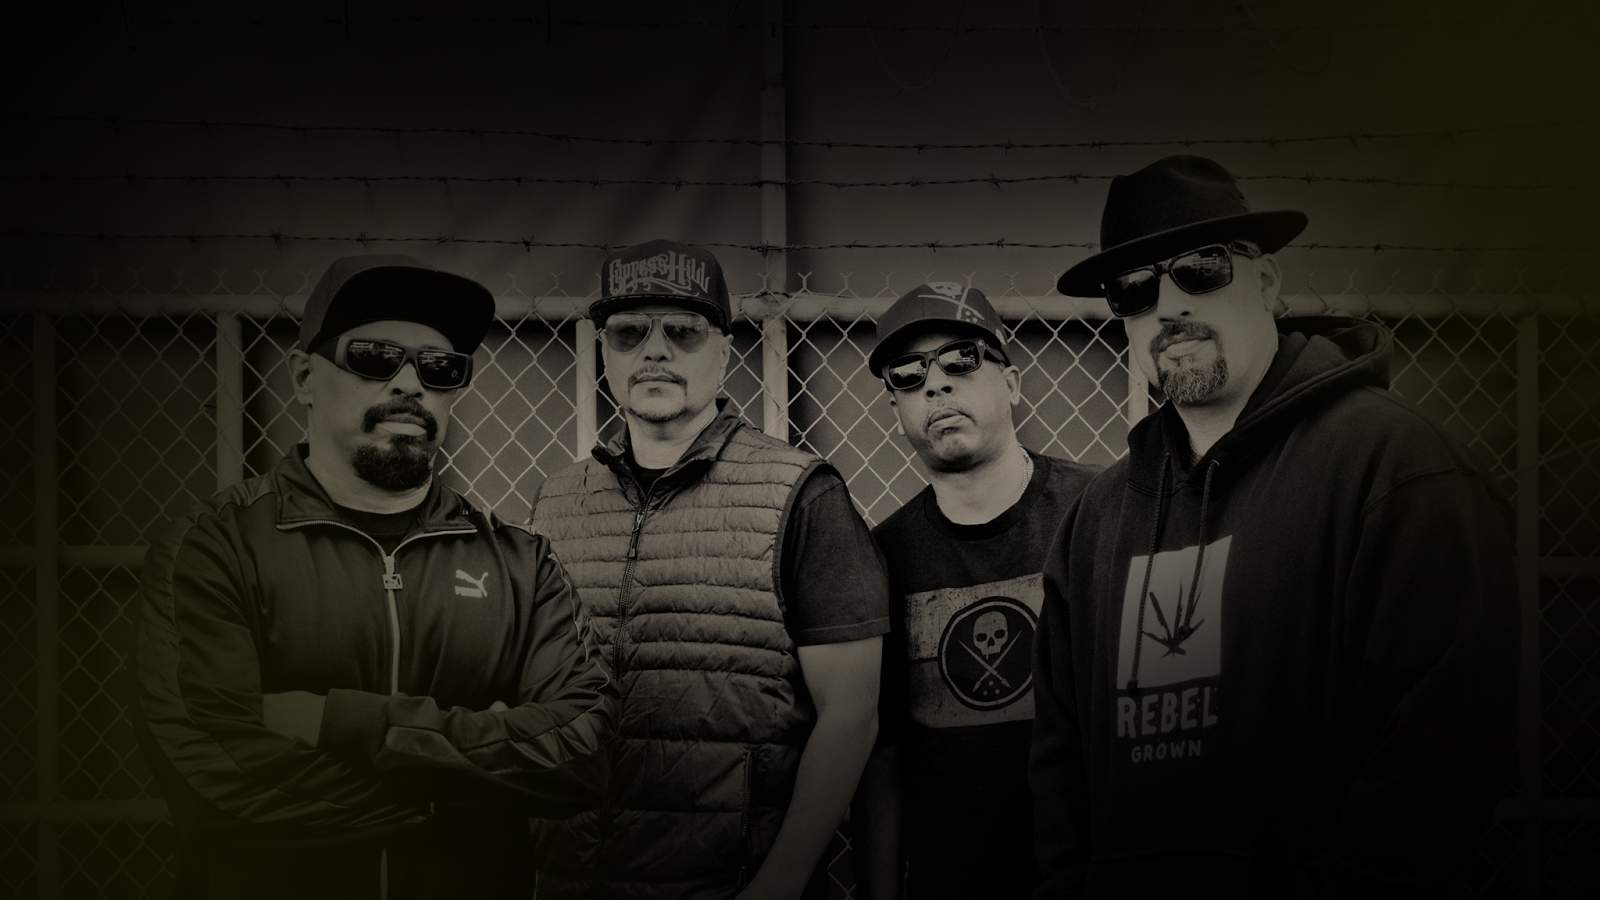 Cypress Hill (Rescheduled from 4/20/2020, 8/14/2020)